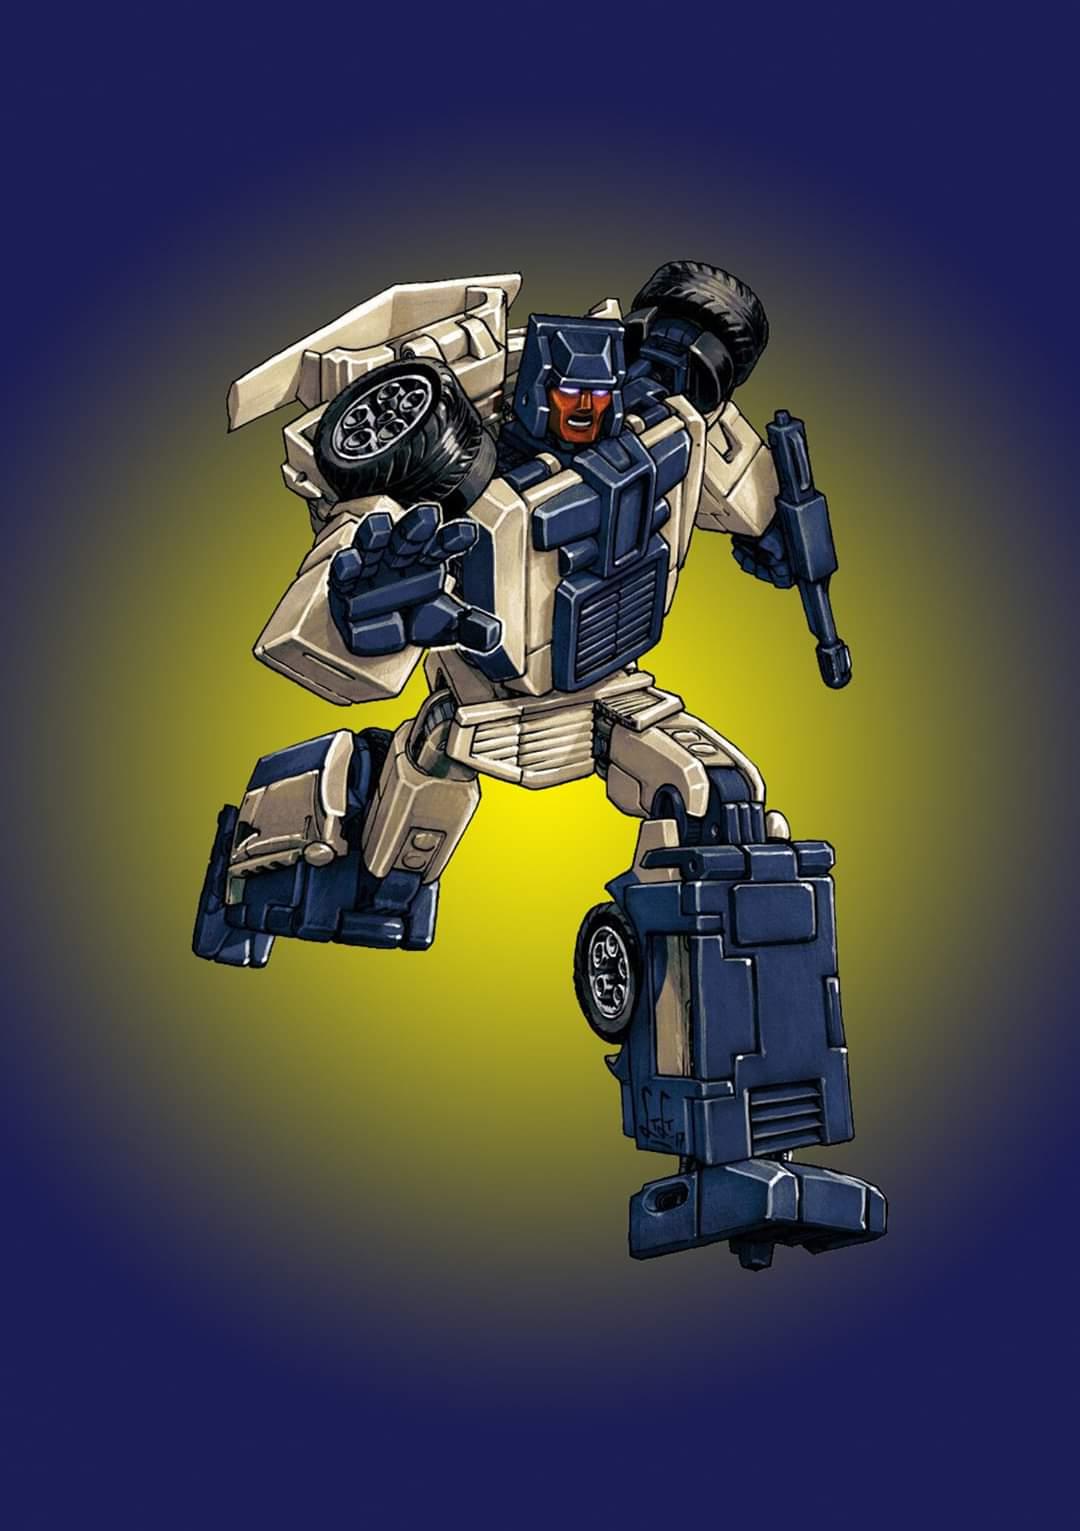 [X-Transbots] Produit Tiers - Jouets Berserkars forme Monolith (MX-XIII à MX-VII) - aka Stunticons forme Menasor/Menaseur - Page 6 RAiRSF71_o